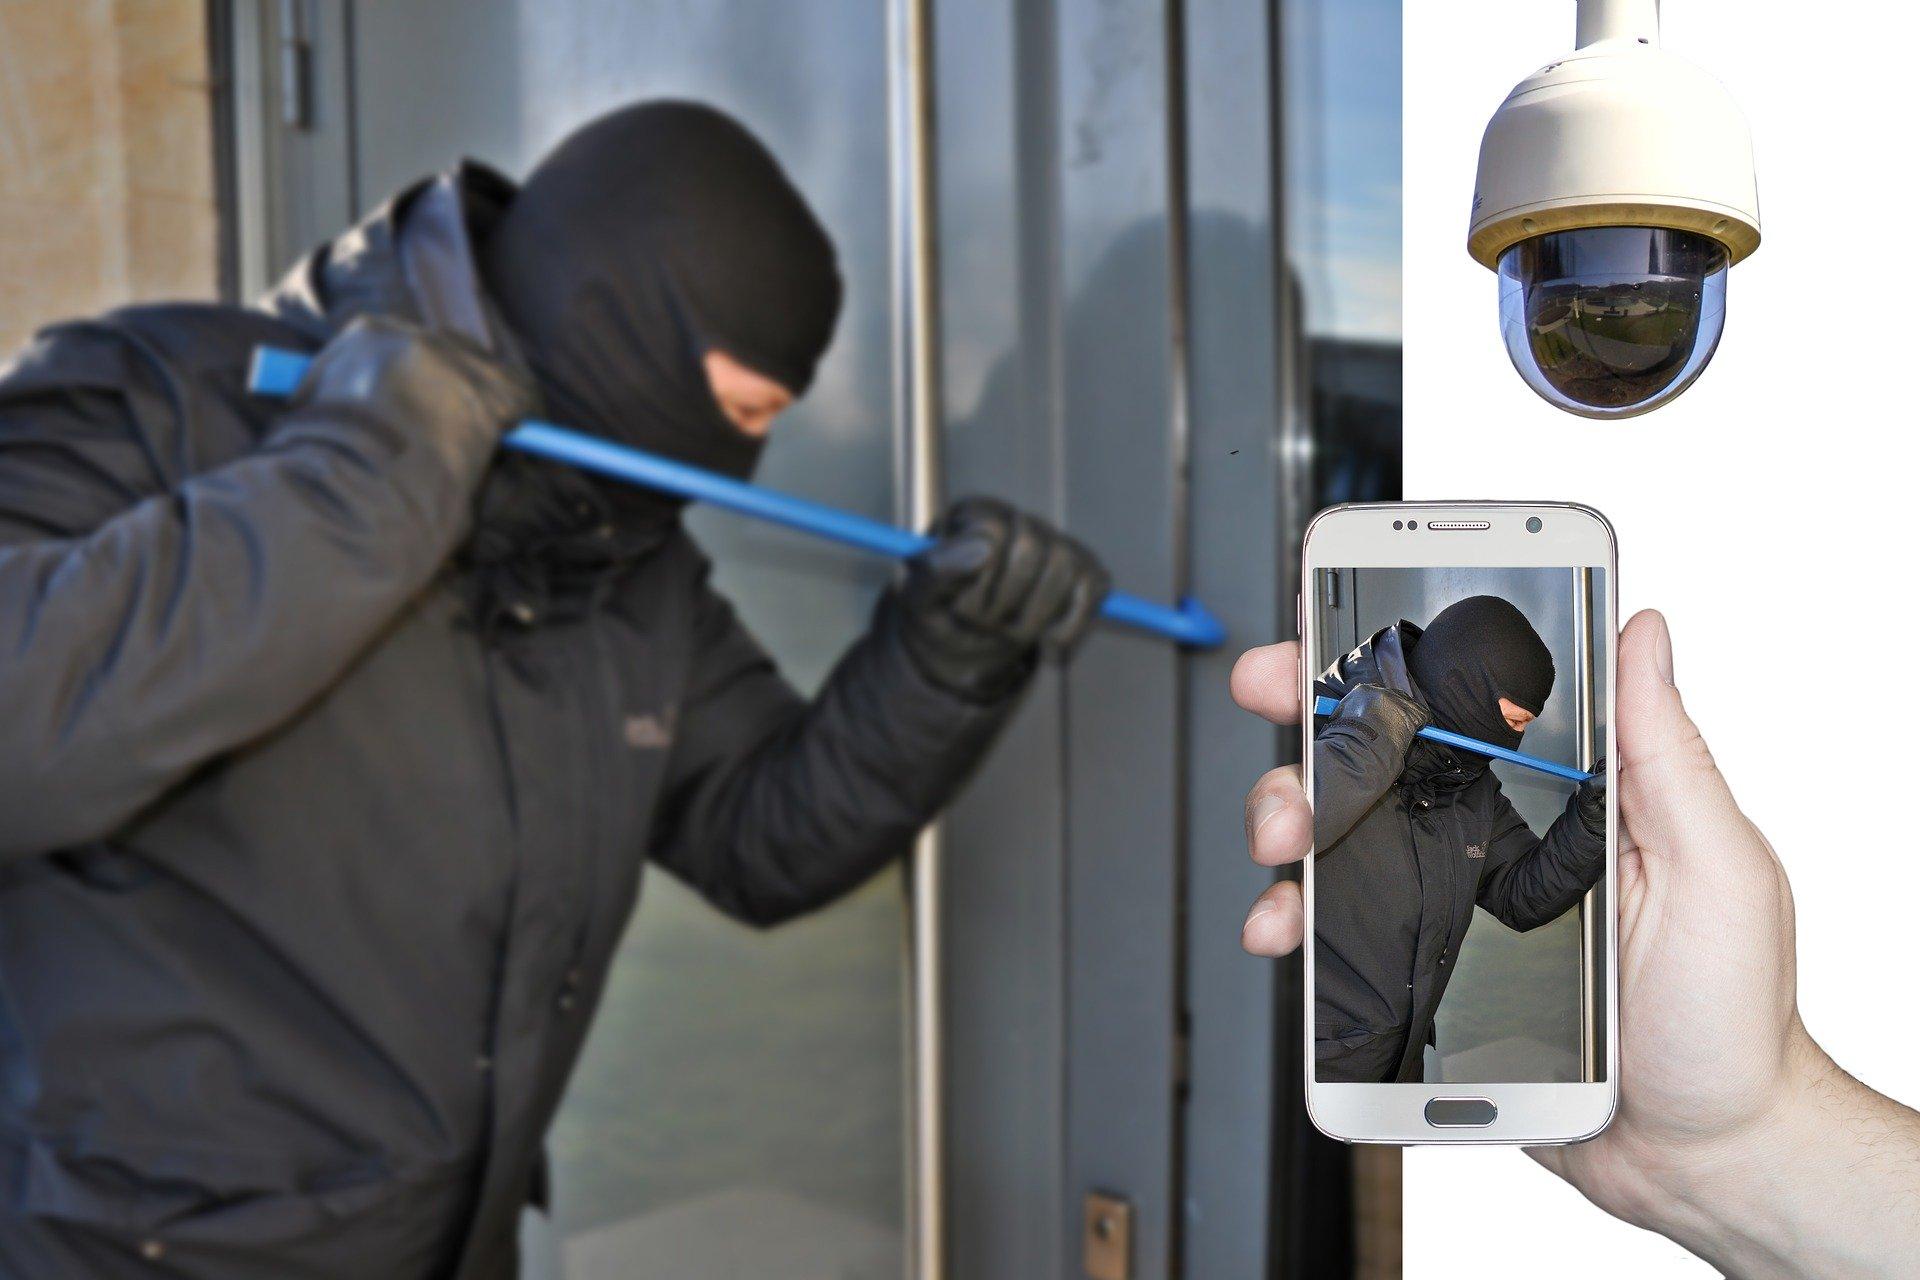 sistema antifurto smart per proteggere la casa